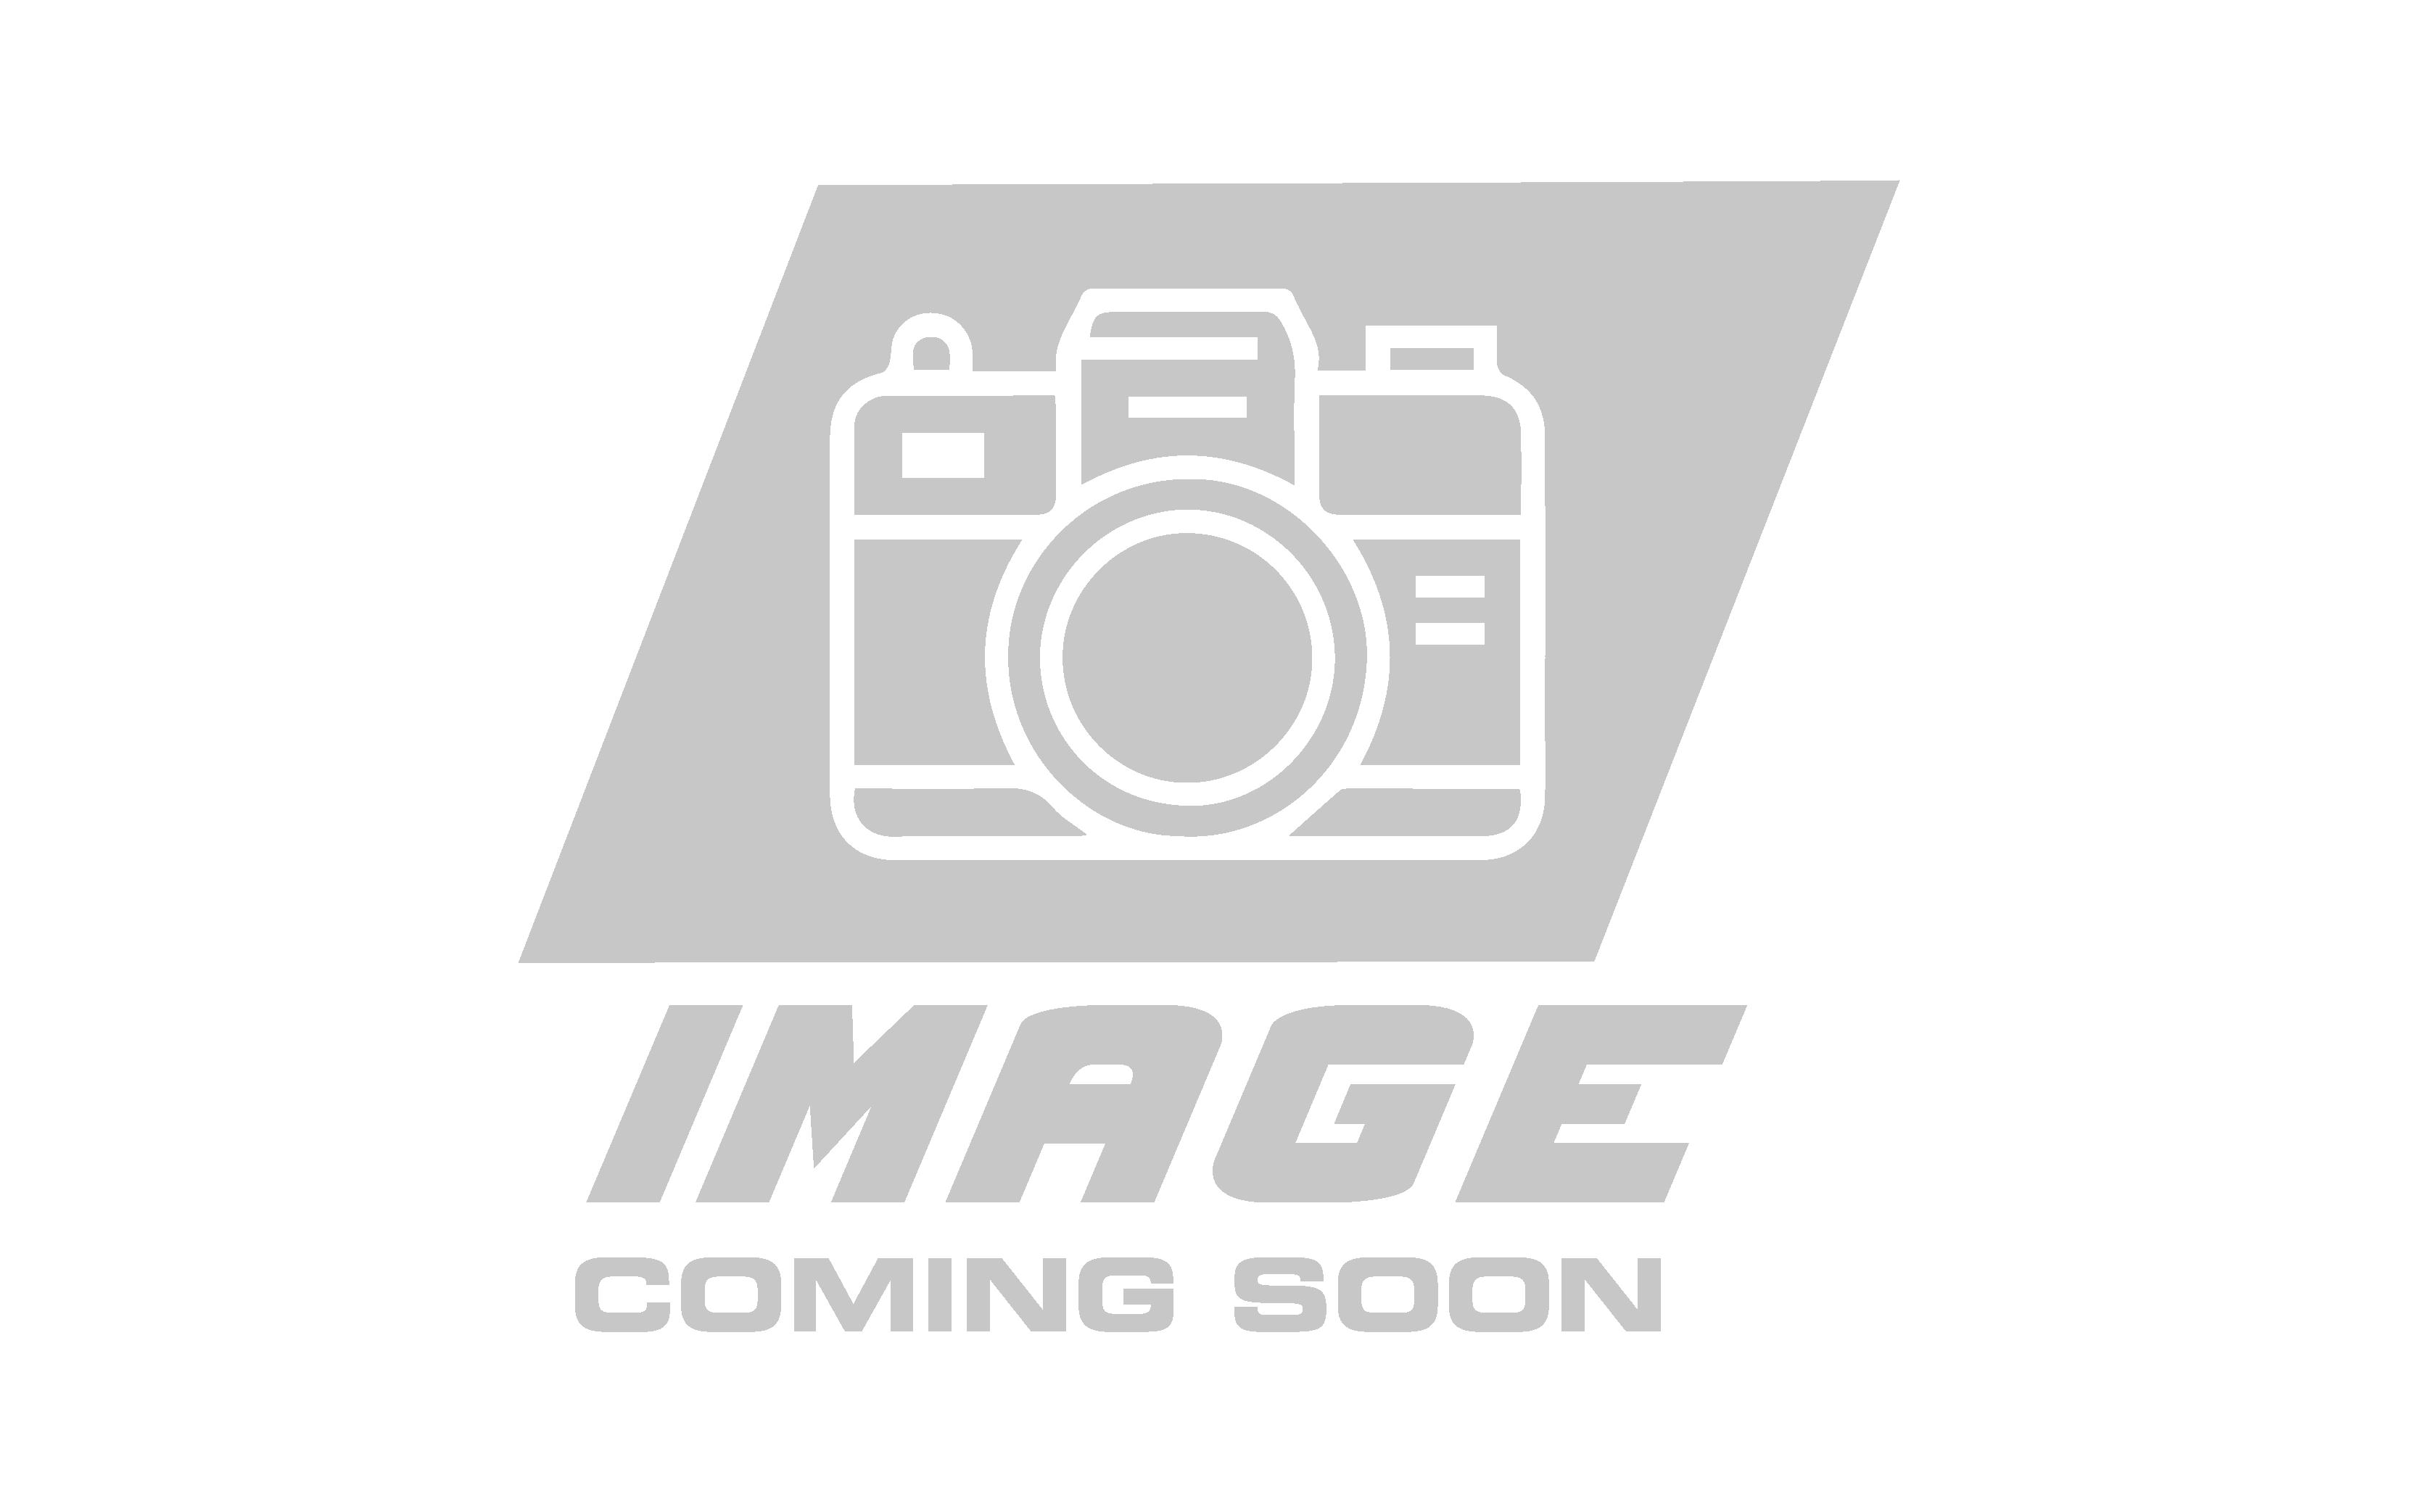 bagriders_blackandgrey_logo_shirt